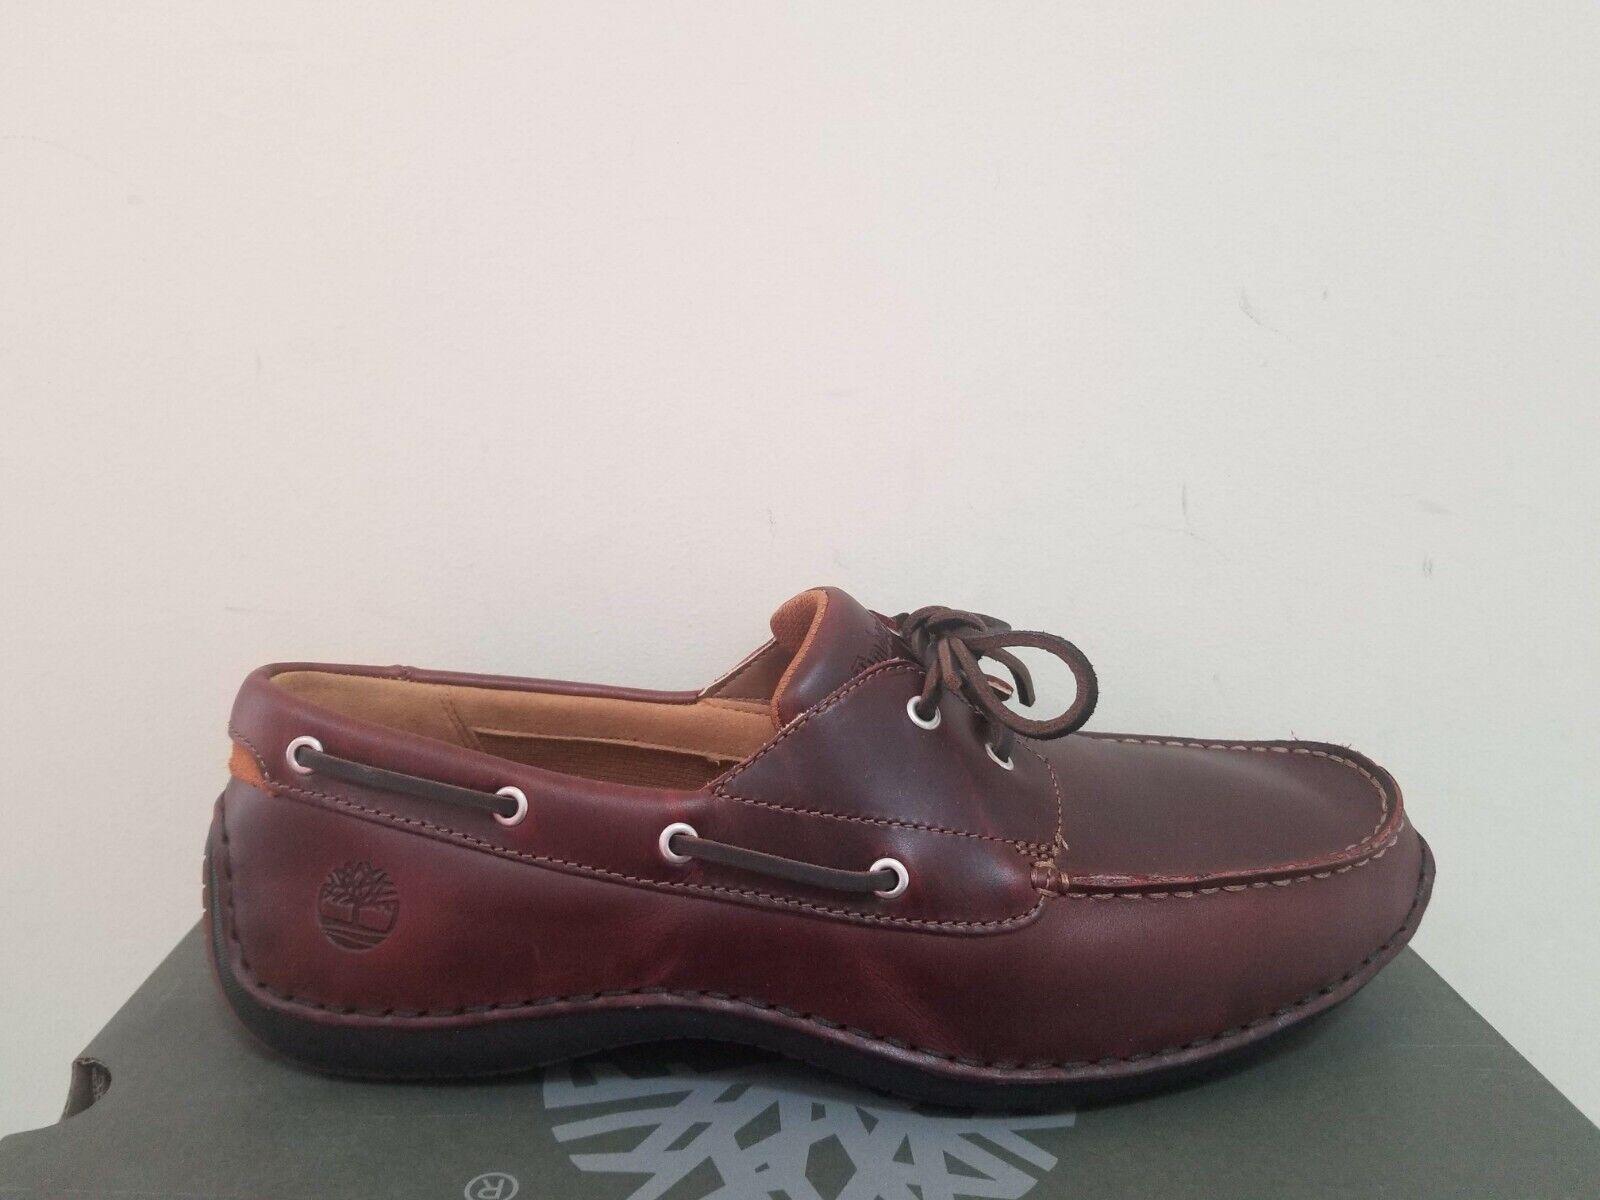 Timberland Men's  Annapolis 2-eye Moc Toe Boat Shoes NIB